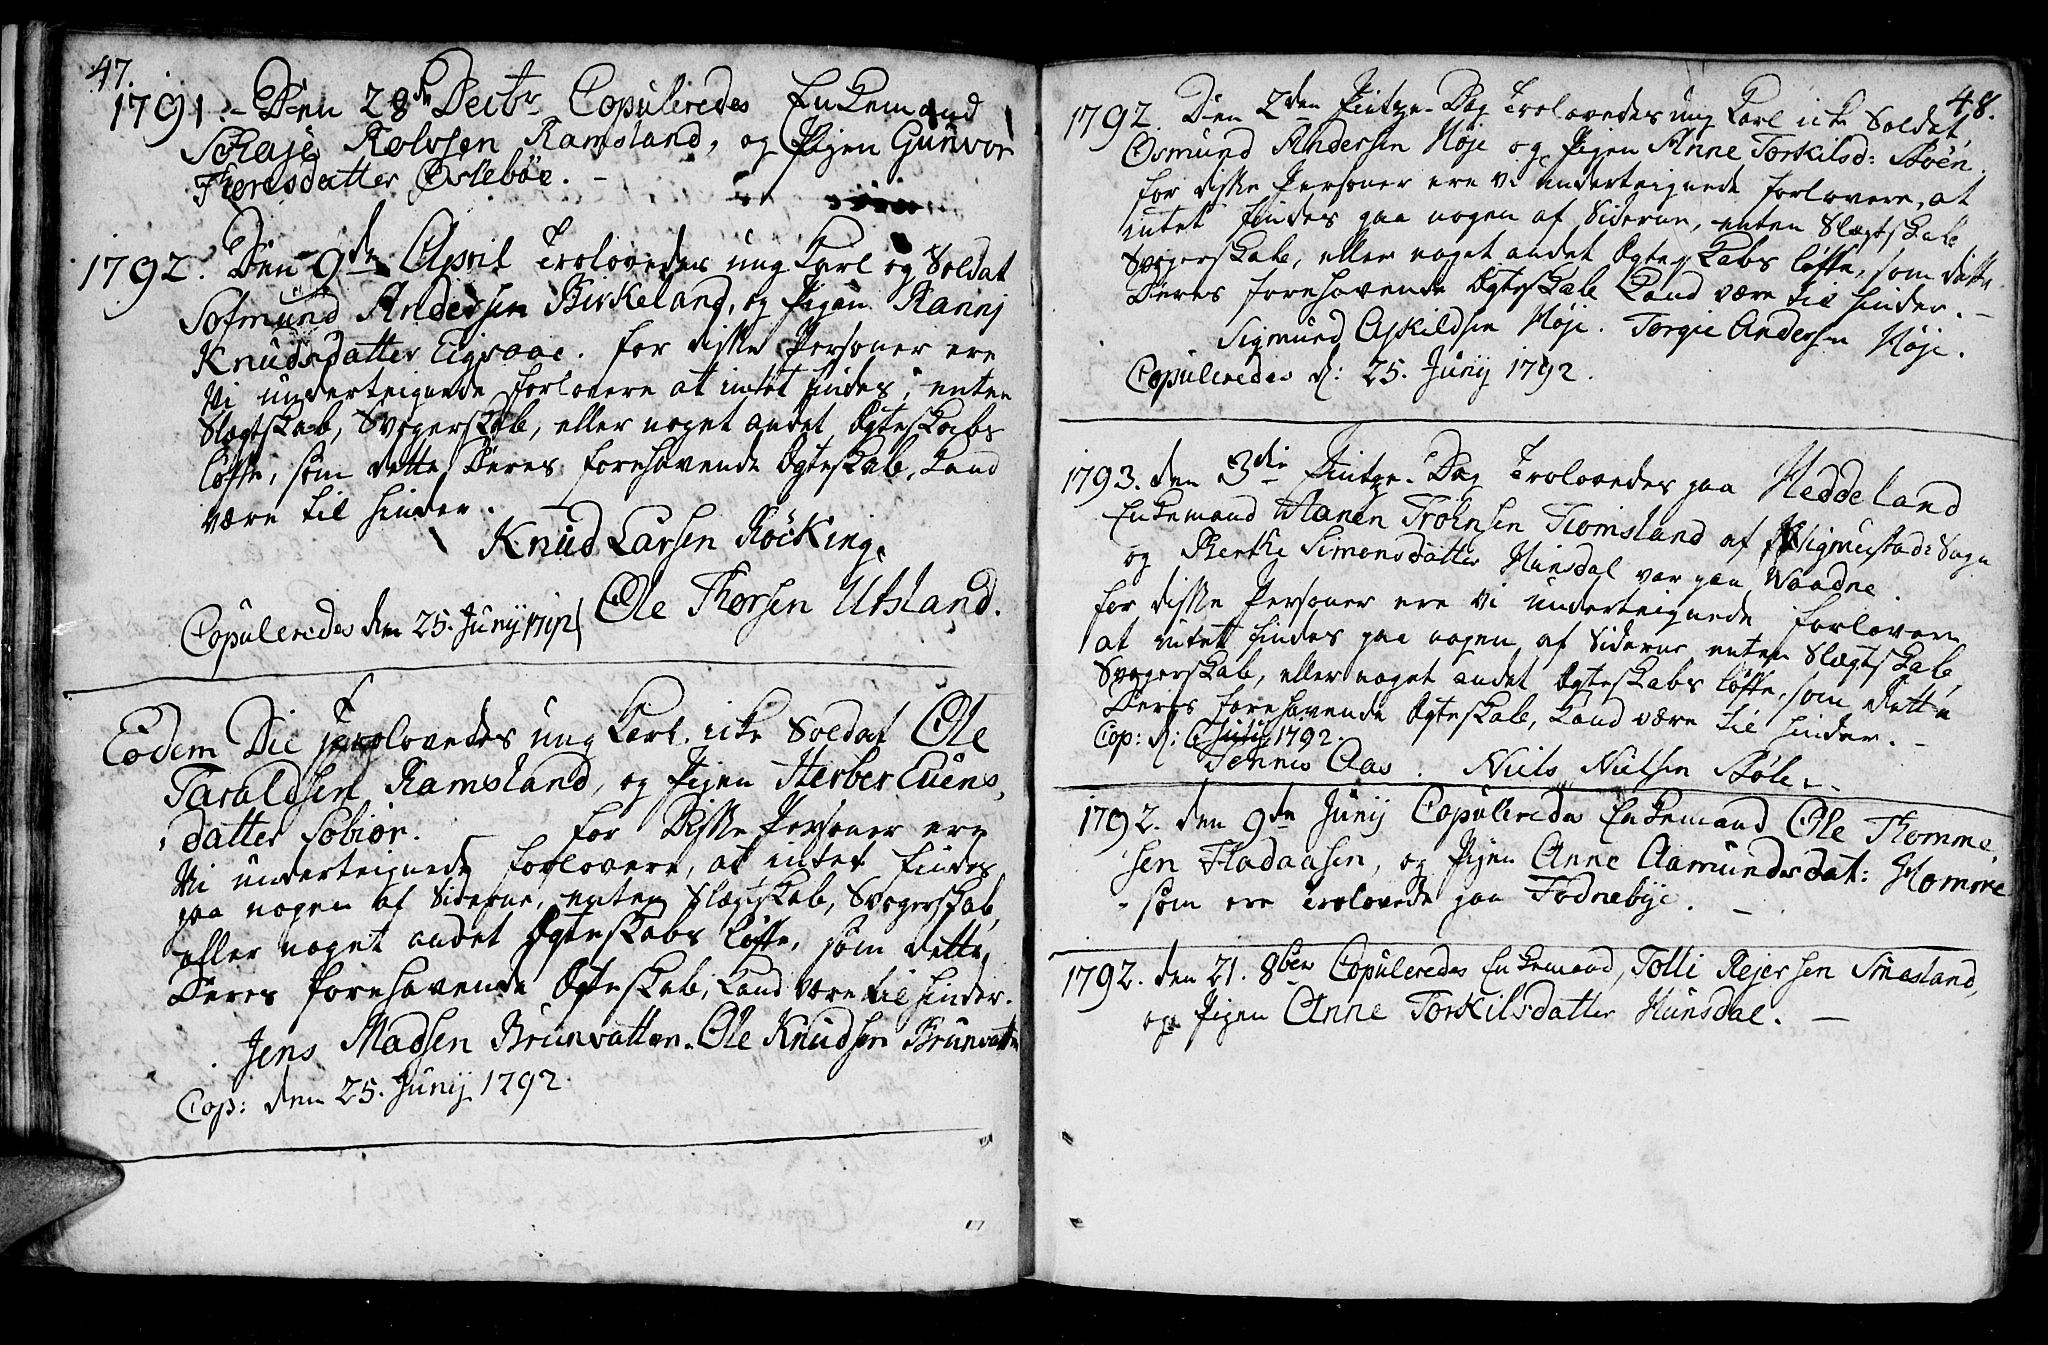 SAK, Holum sokneprestkontor, F/Fa/Fac/L0001: Ministerialbok nr. A 1, 1773-1820, s. 47-48